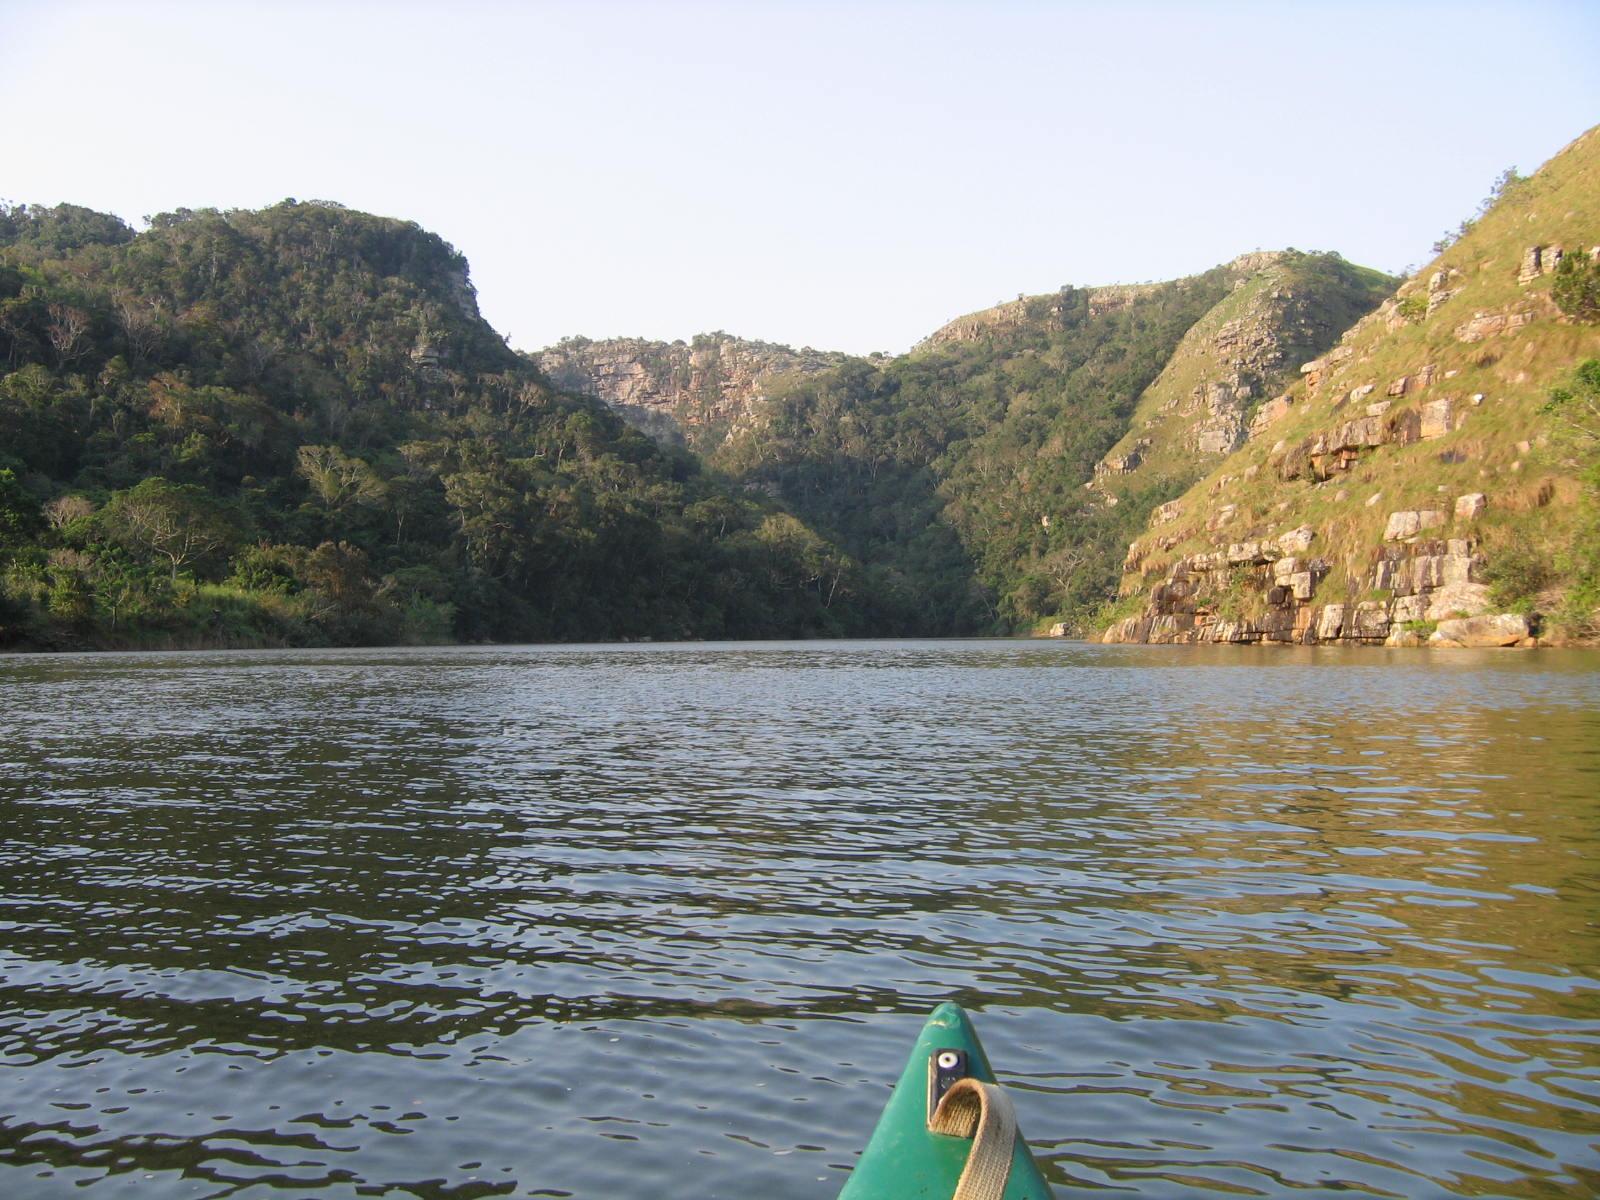 retour de la cascade en canoë, wild coast